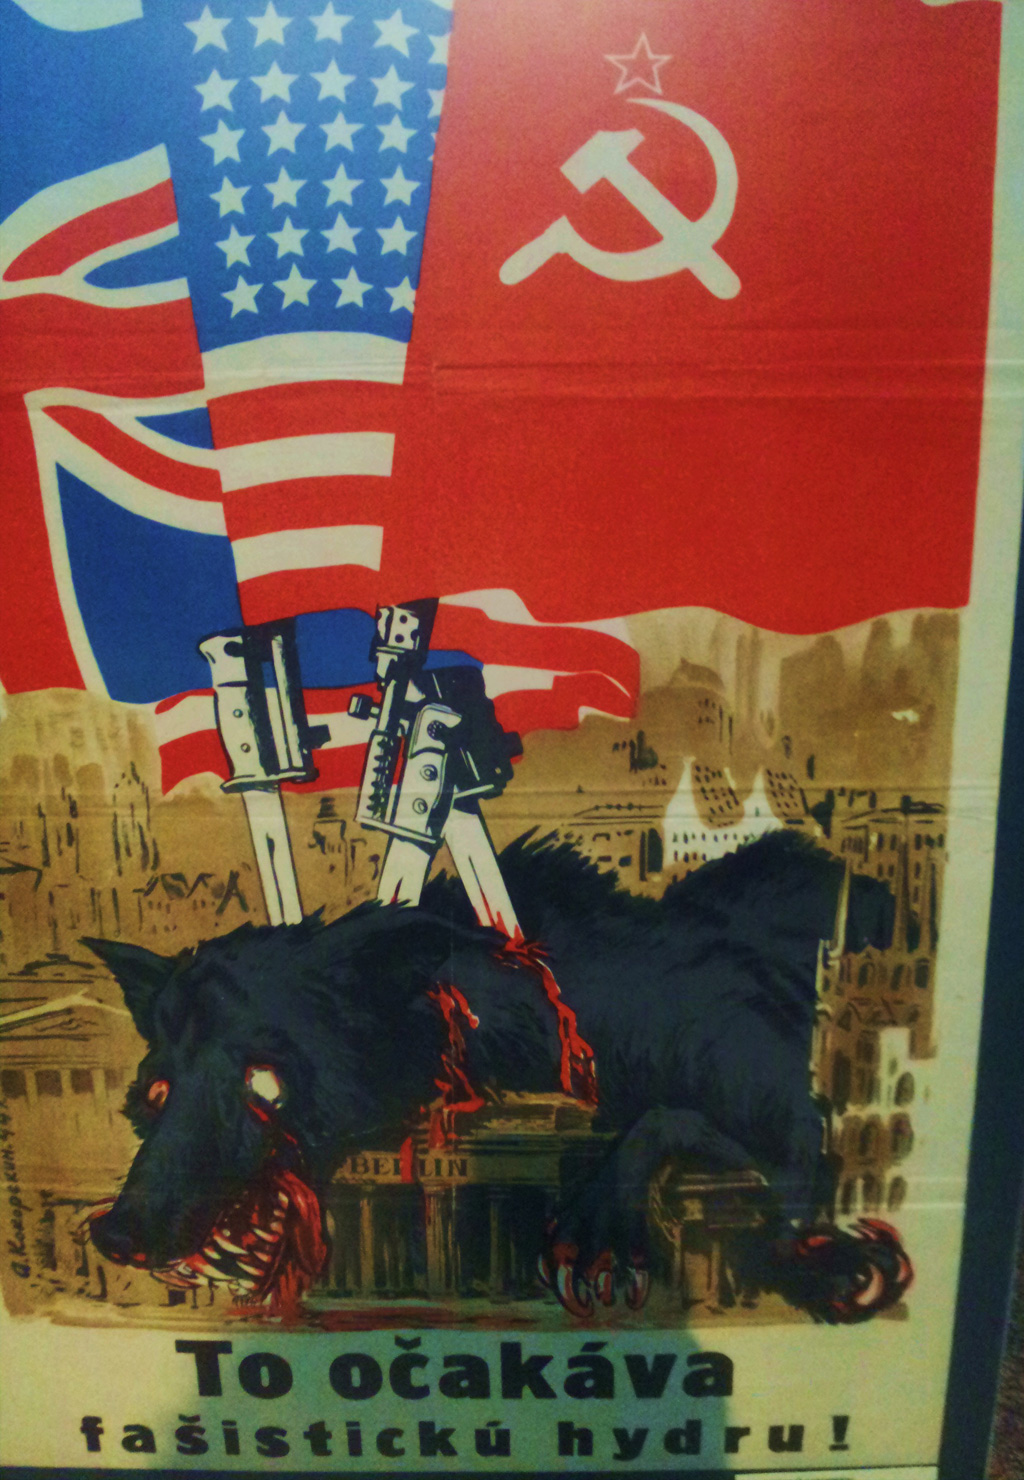 Antinazi-propaganda in het WOII-museum